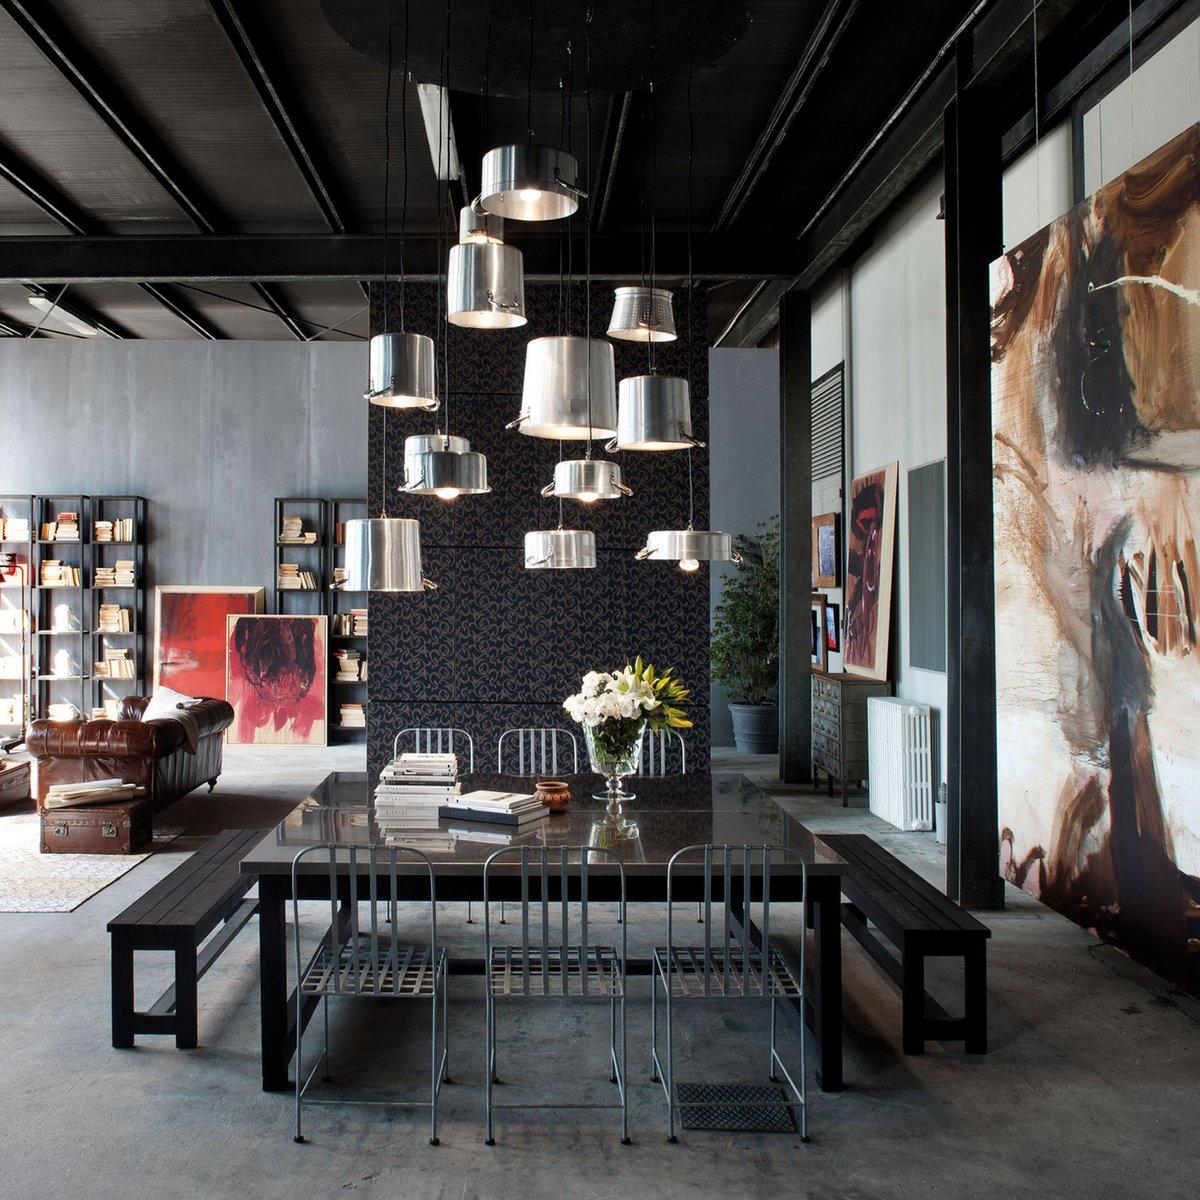 Silvio Stefani, Loft Minacciolo, лофт фото, лофт в Италии, лофт в Милане фото, полированный бетон в интерьере фото, дерево и металл в интерьере фото